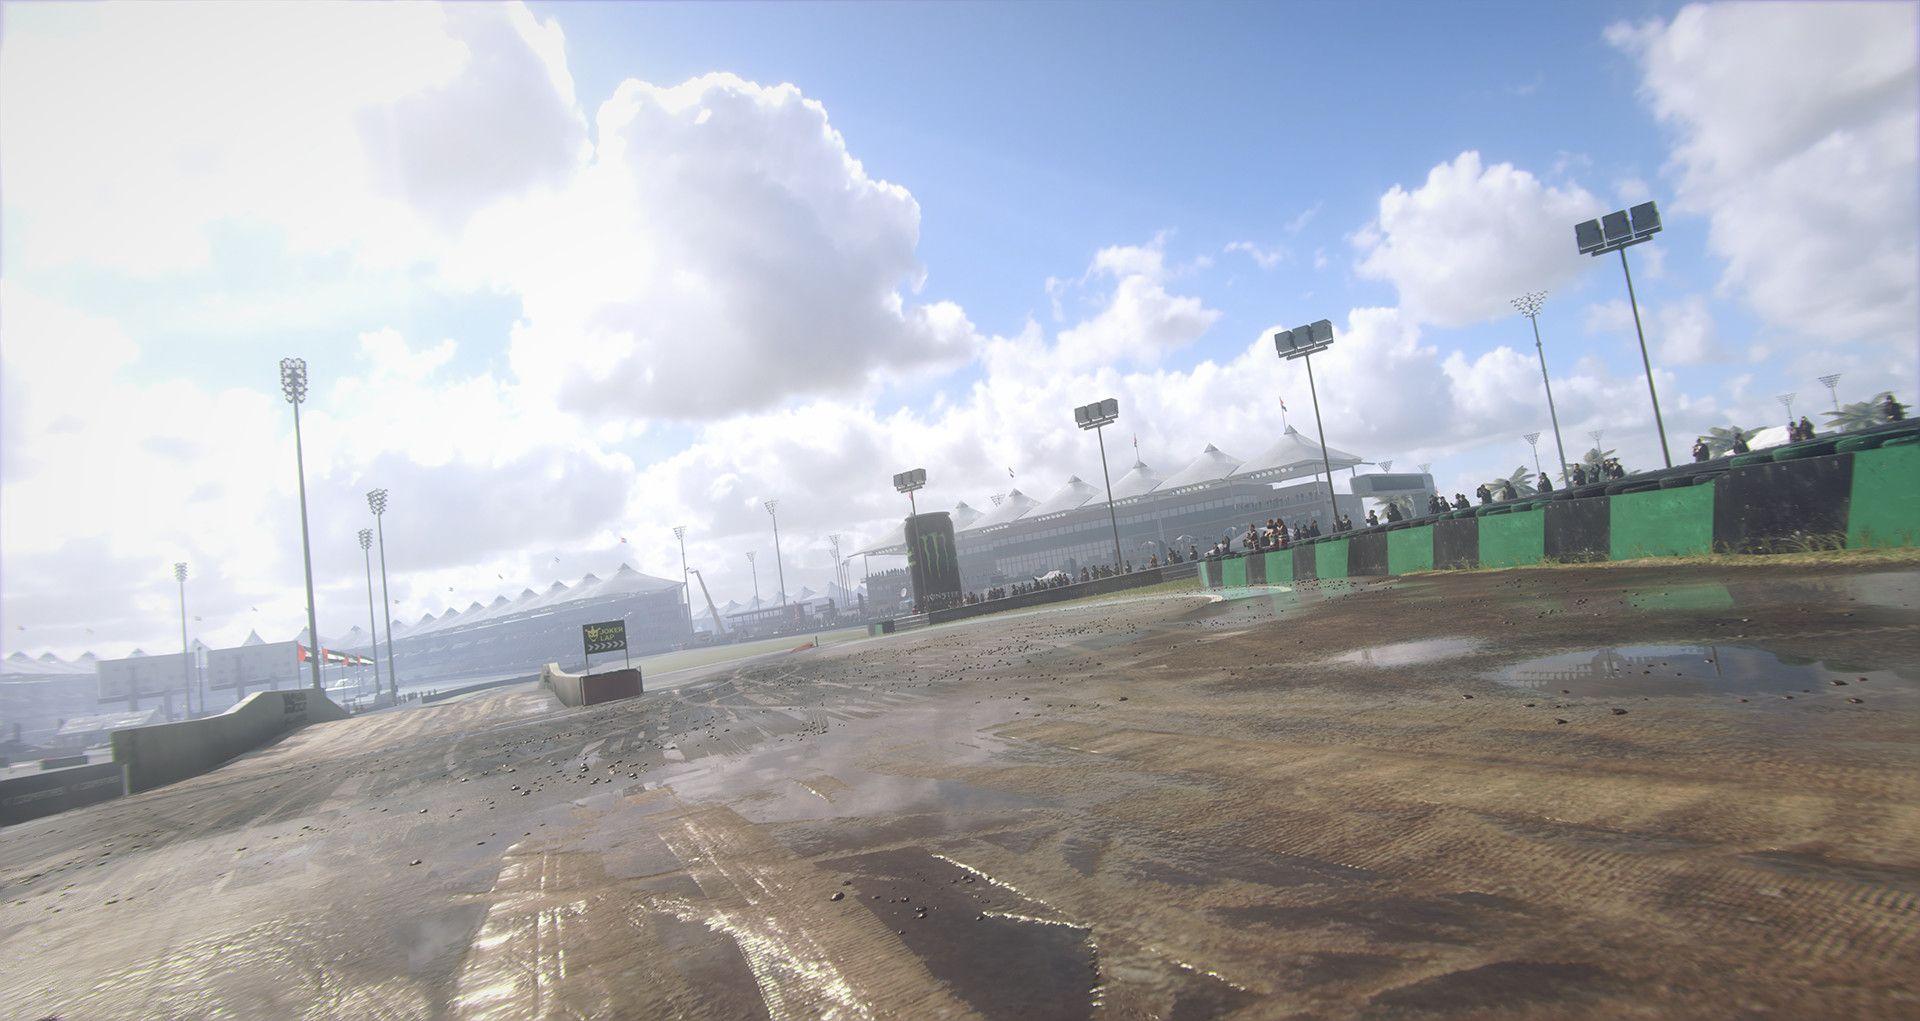 DiRT Rally 2.0: Yas Marina Circuit, Abu Dhabi (Rallycross Track) | Buy Now  | DPSimulation